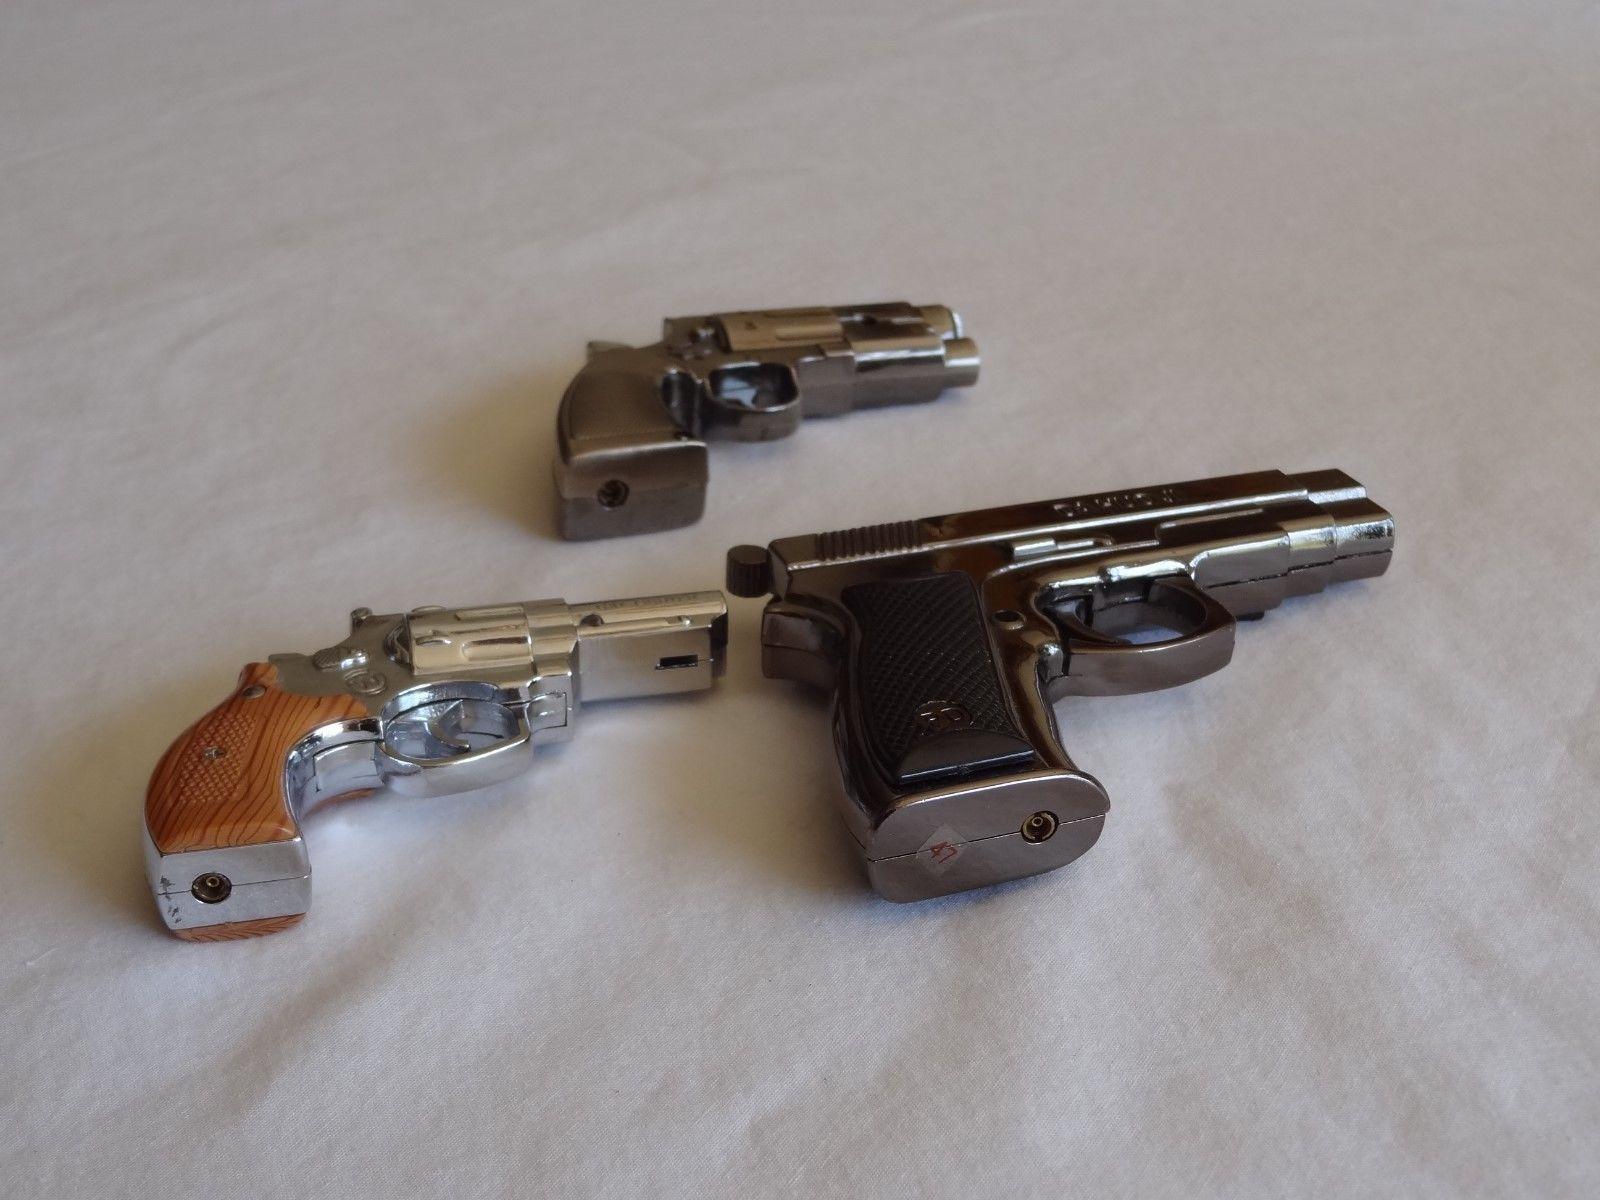 4 Novelty Gun Pistol Shaped Cigarette and similar items